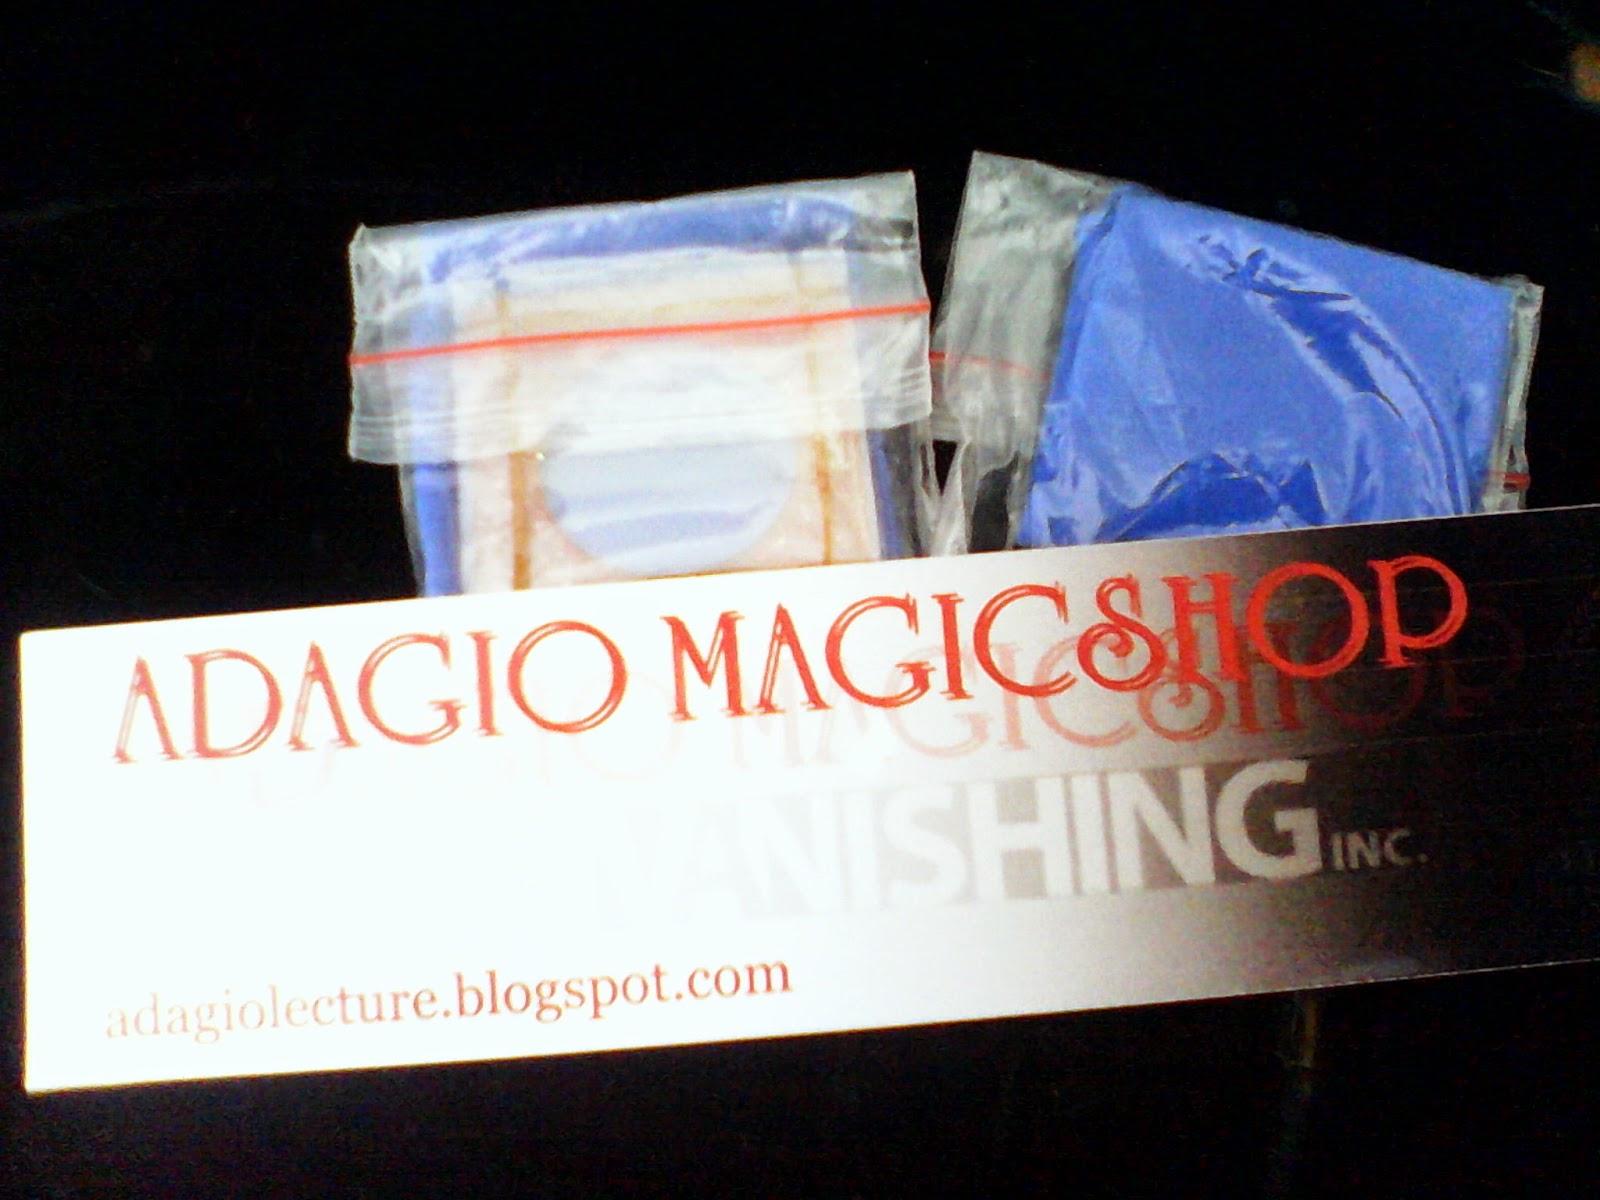 Adagio Magic Shop April 2015 Austin Flats Maxime Black Hitam 38 Harga 25000